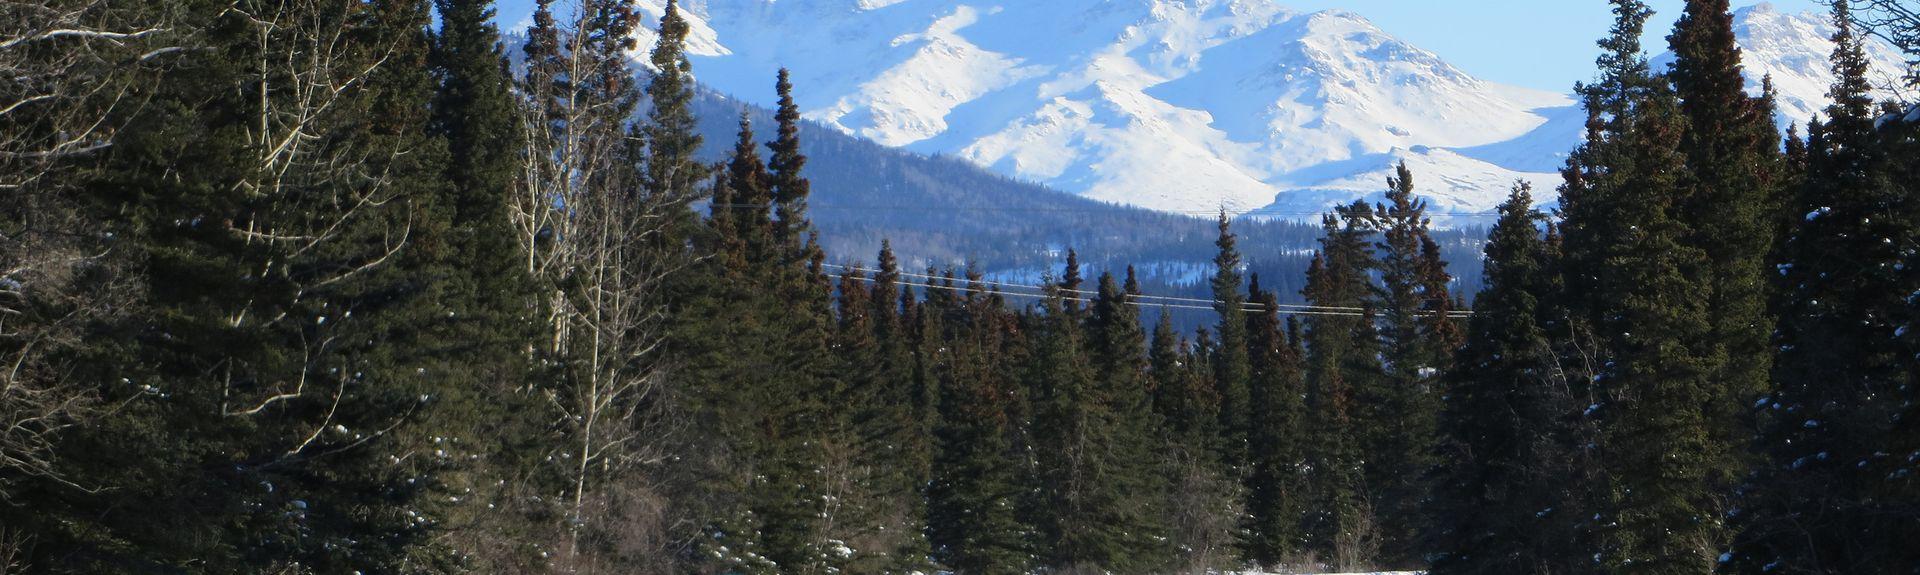 Wilderness Access Center, Denali National Park, Alaska, United States of America